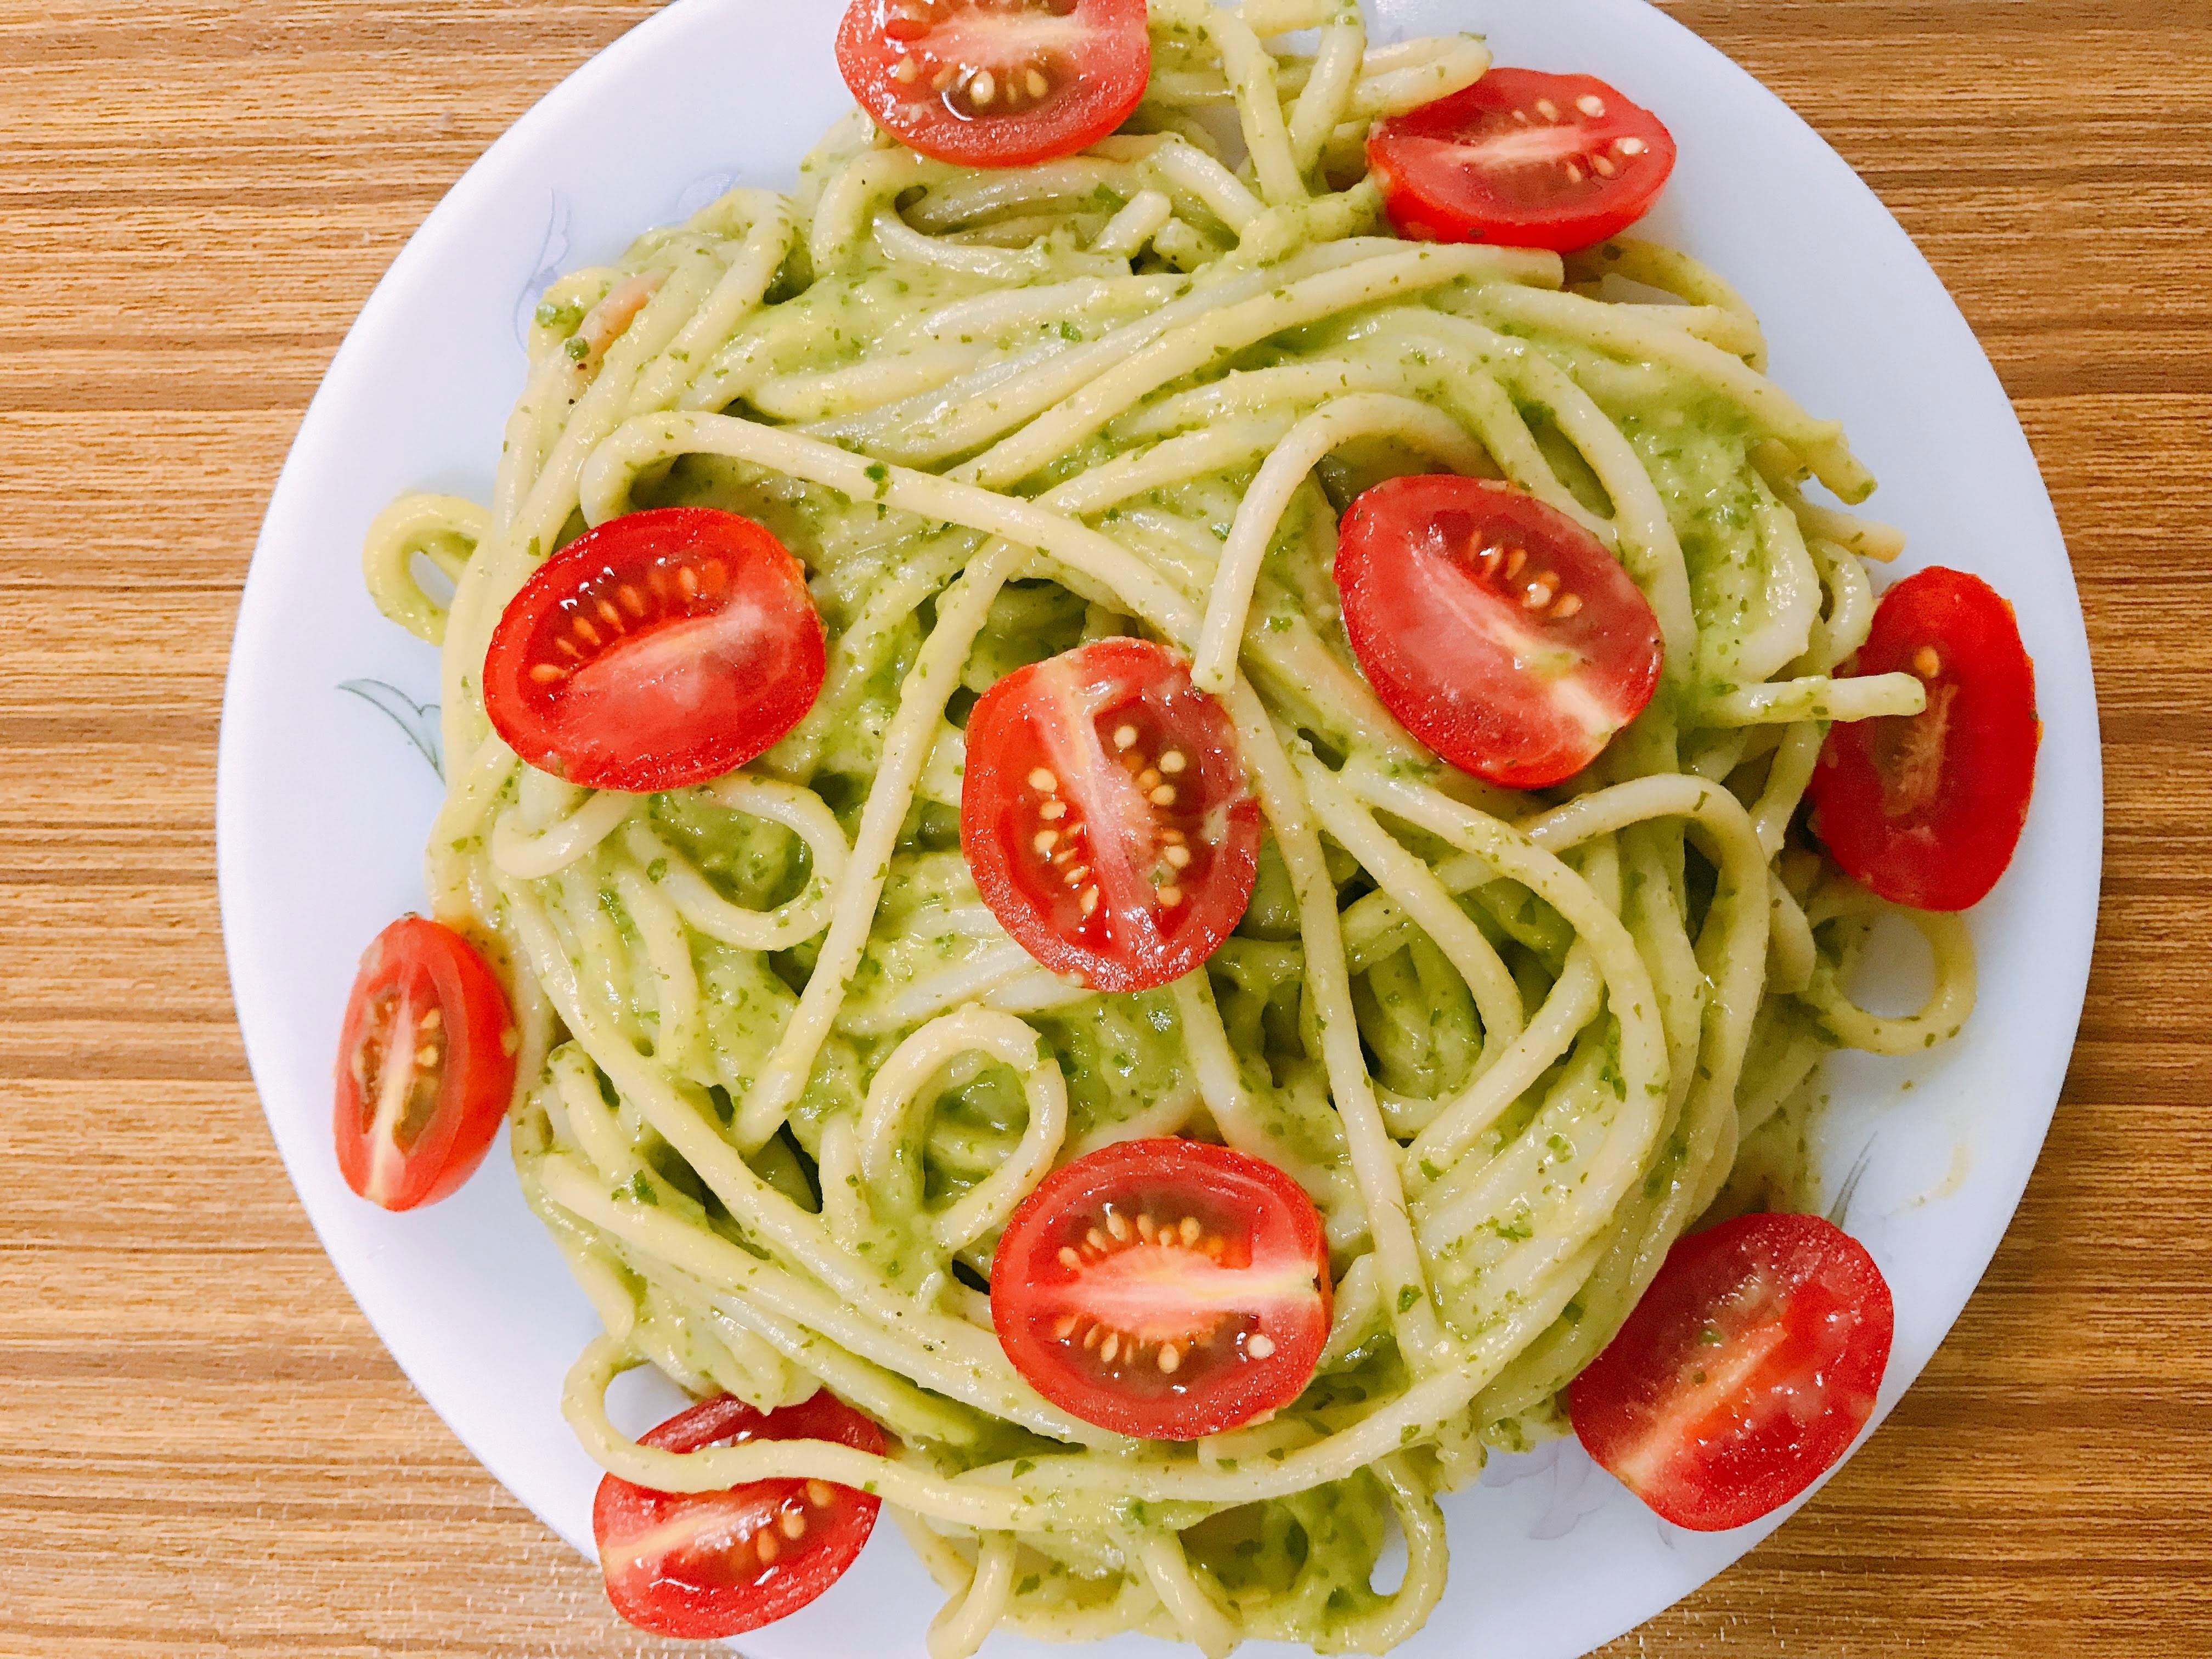 Creamy+Avocado+Spinach+Pasta+-+Your+Veg+Recipe